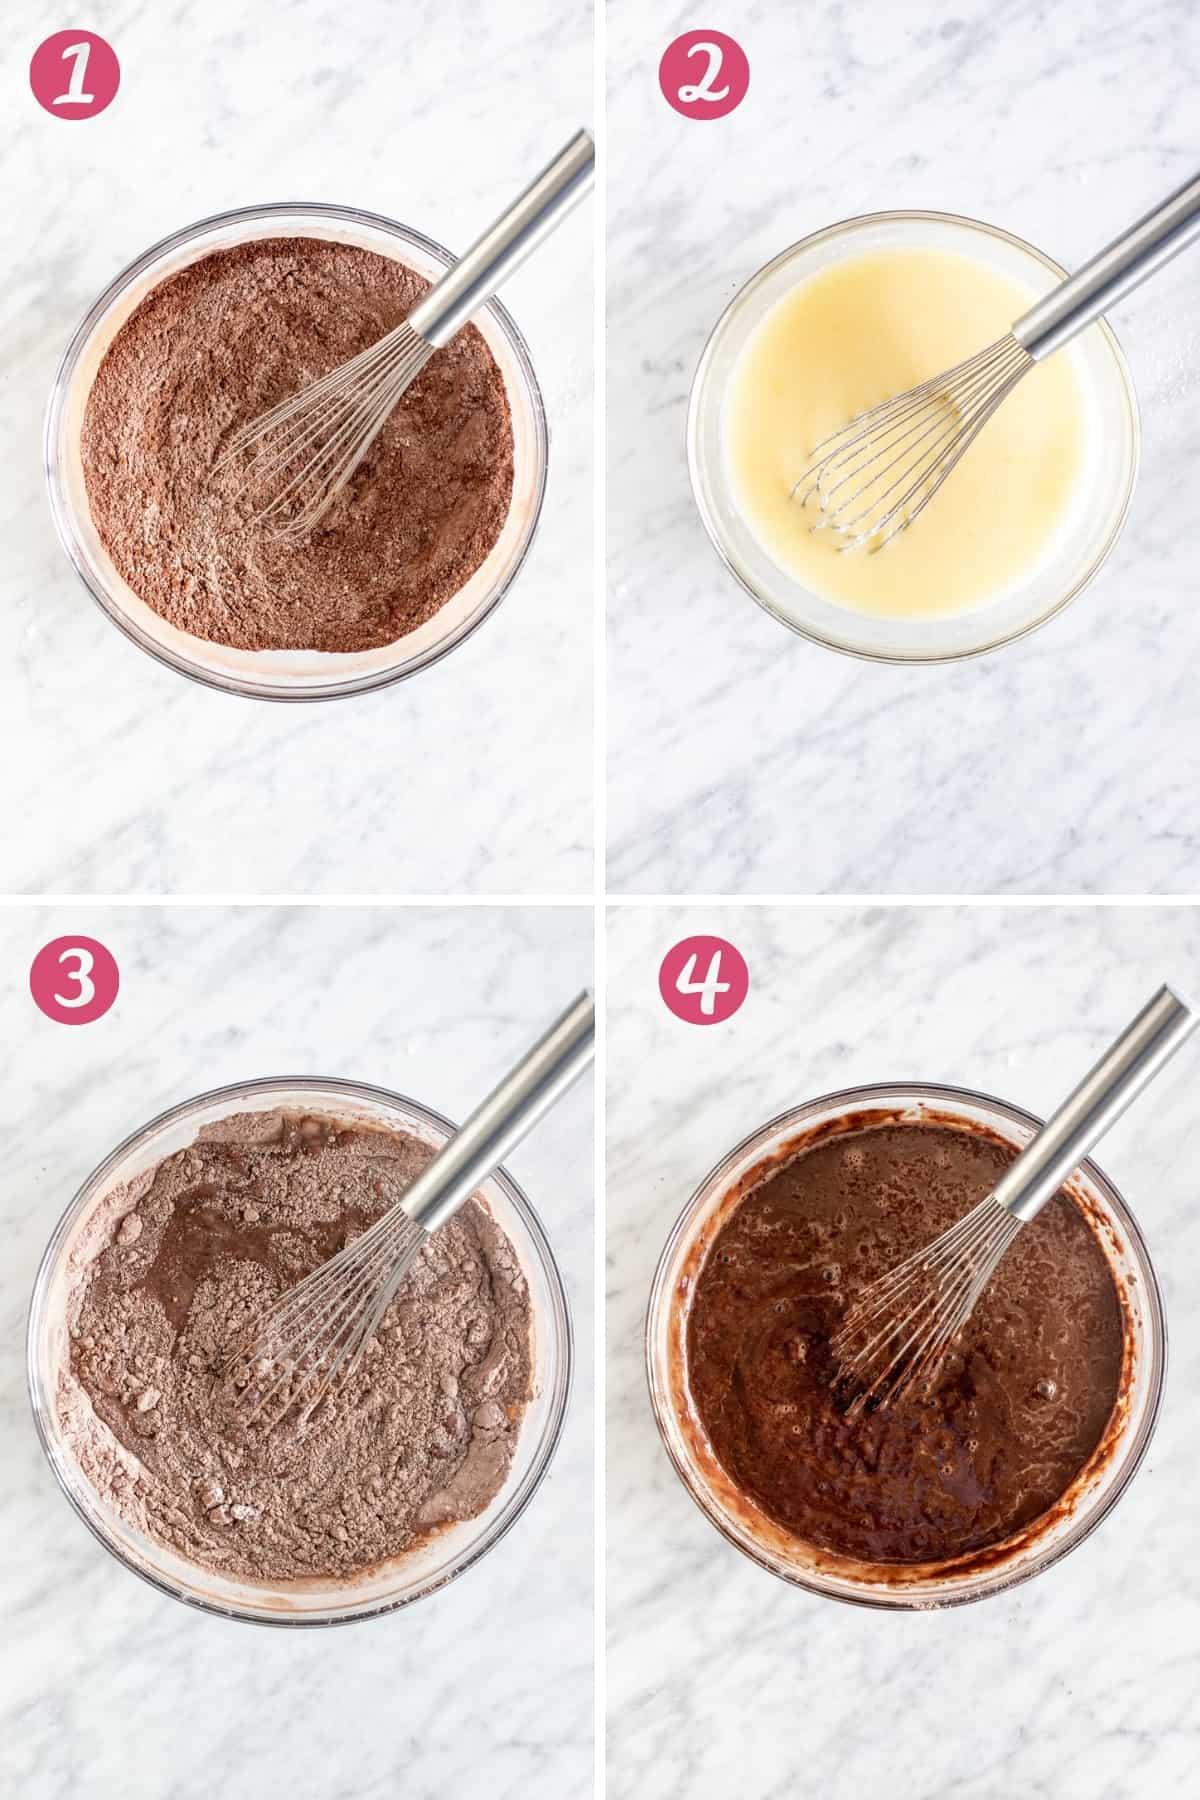 4 step process of making chocolate cake batter